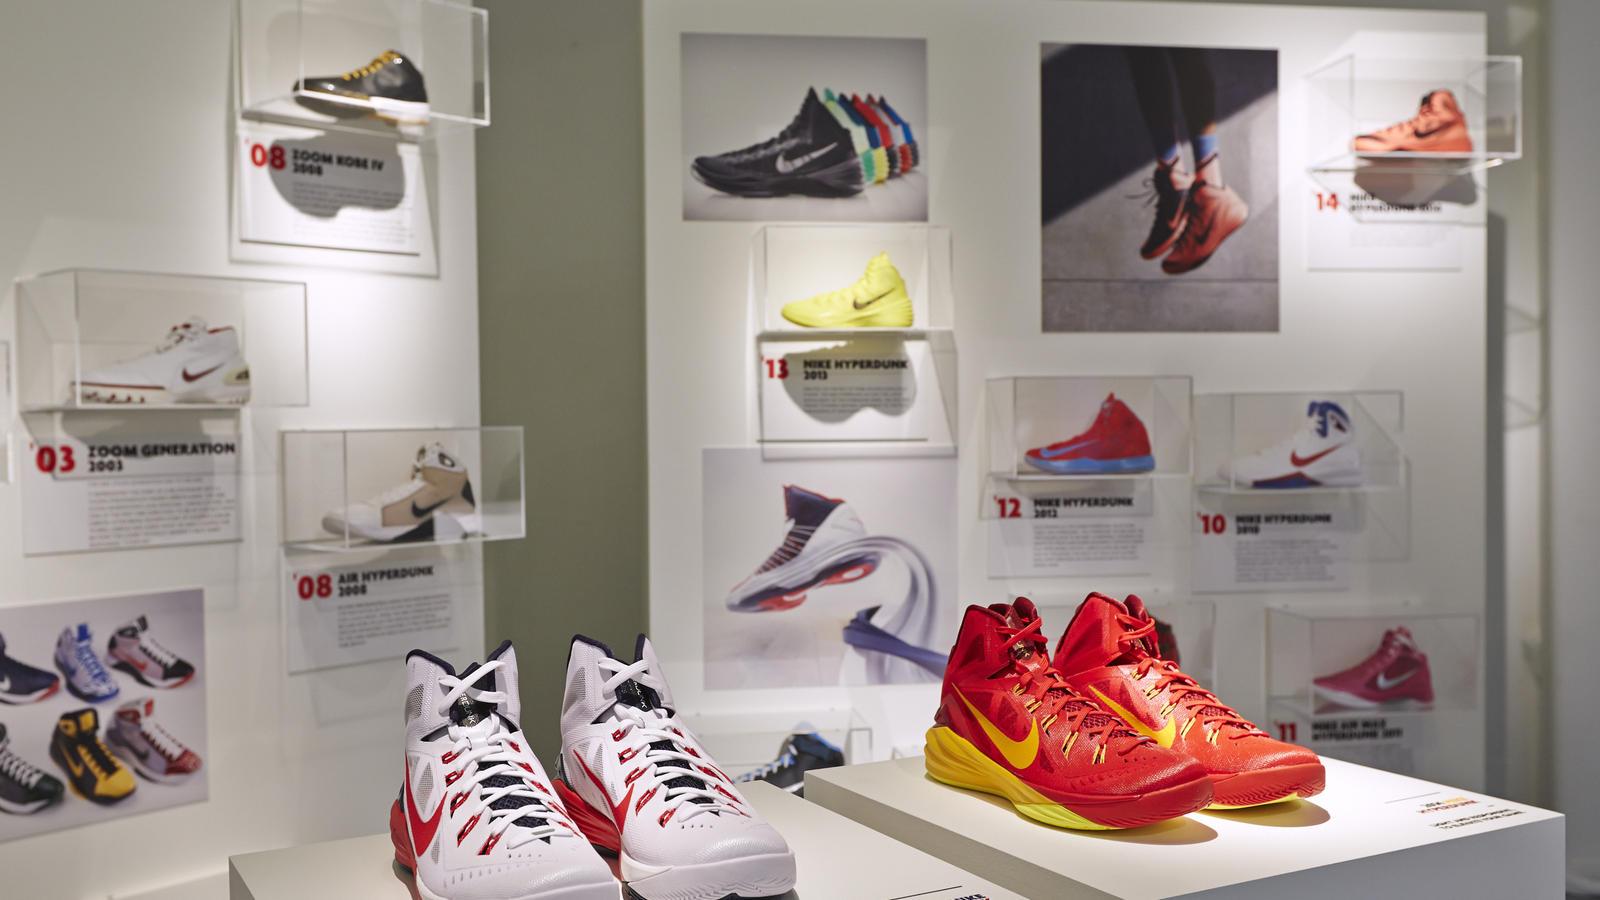 WBF_Nike_Basketball_Jordan_Innovation_Design_Showcase_05